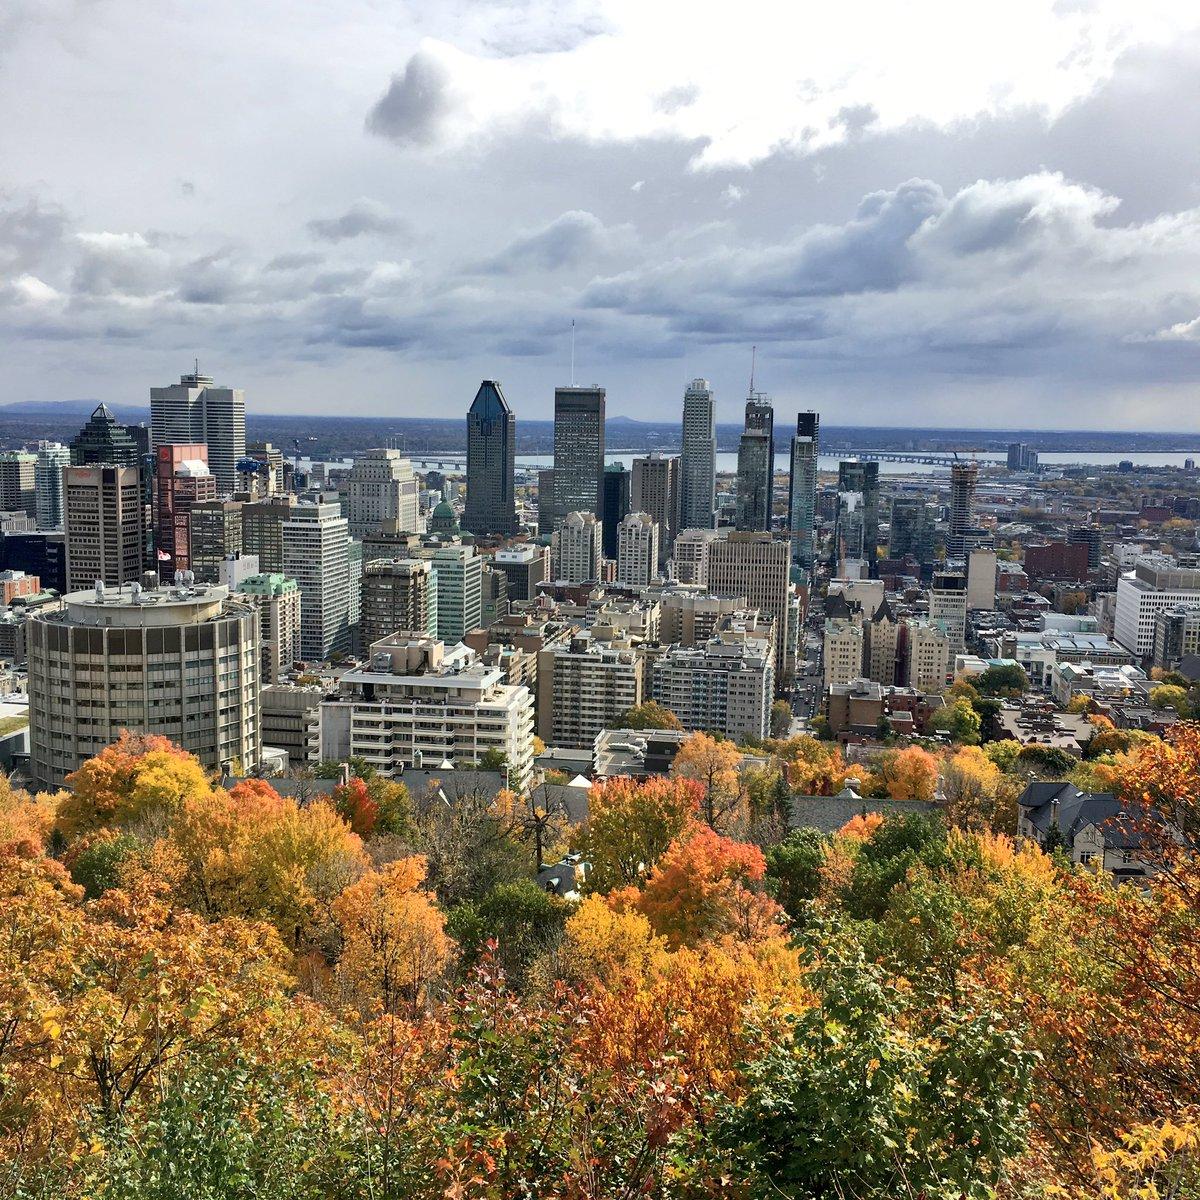 #Montreal meilleure ville universitaire du monde !  #MTL #Quebec #Canada  http:// m.huffpost.com/qc/entry/14768 050 &nbsp; … <br>http://pic.twitter.com/wOOjiuPF7R